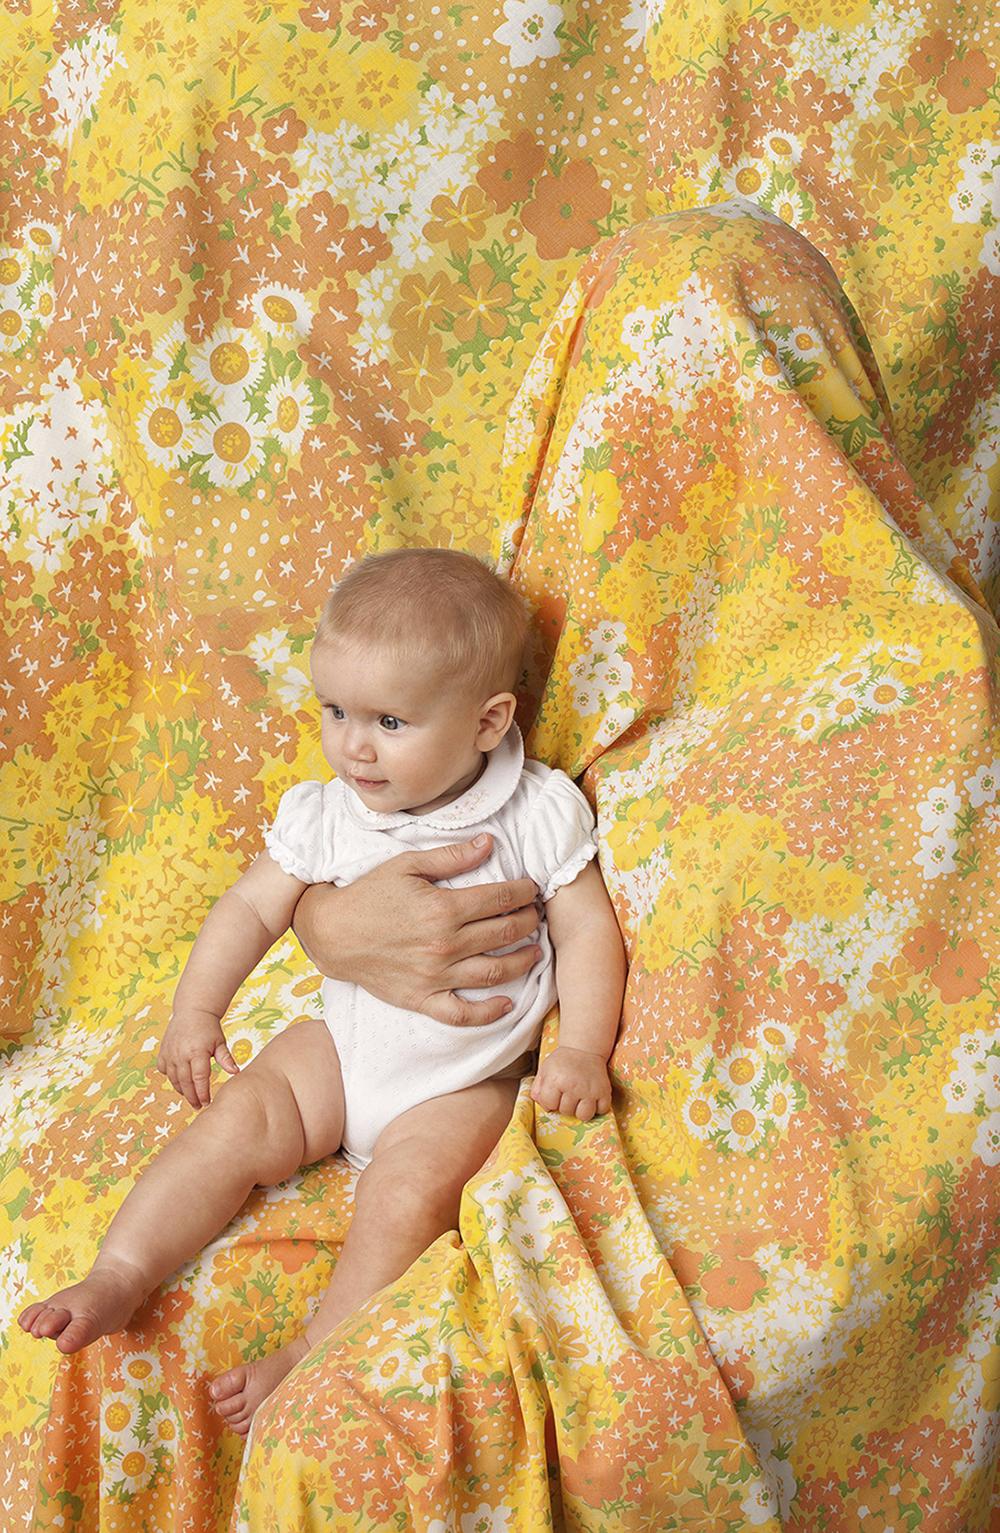 Hidden Mothers: Jessica , Archival Pigment Print, 2017 © Megan Jacobs